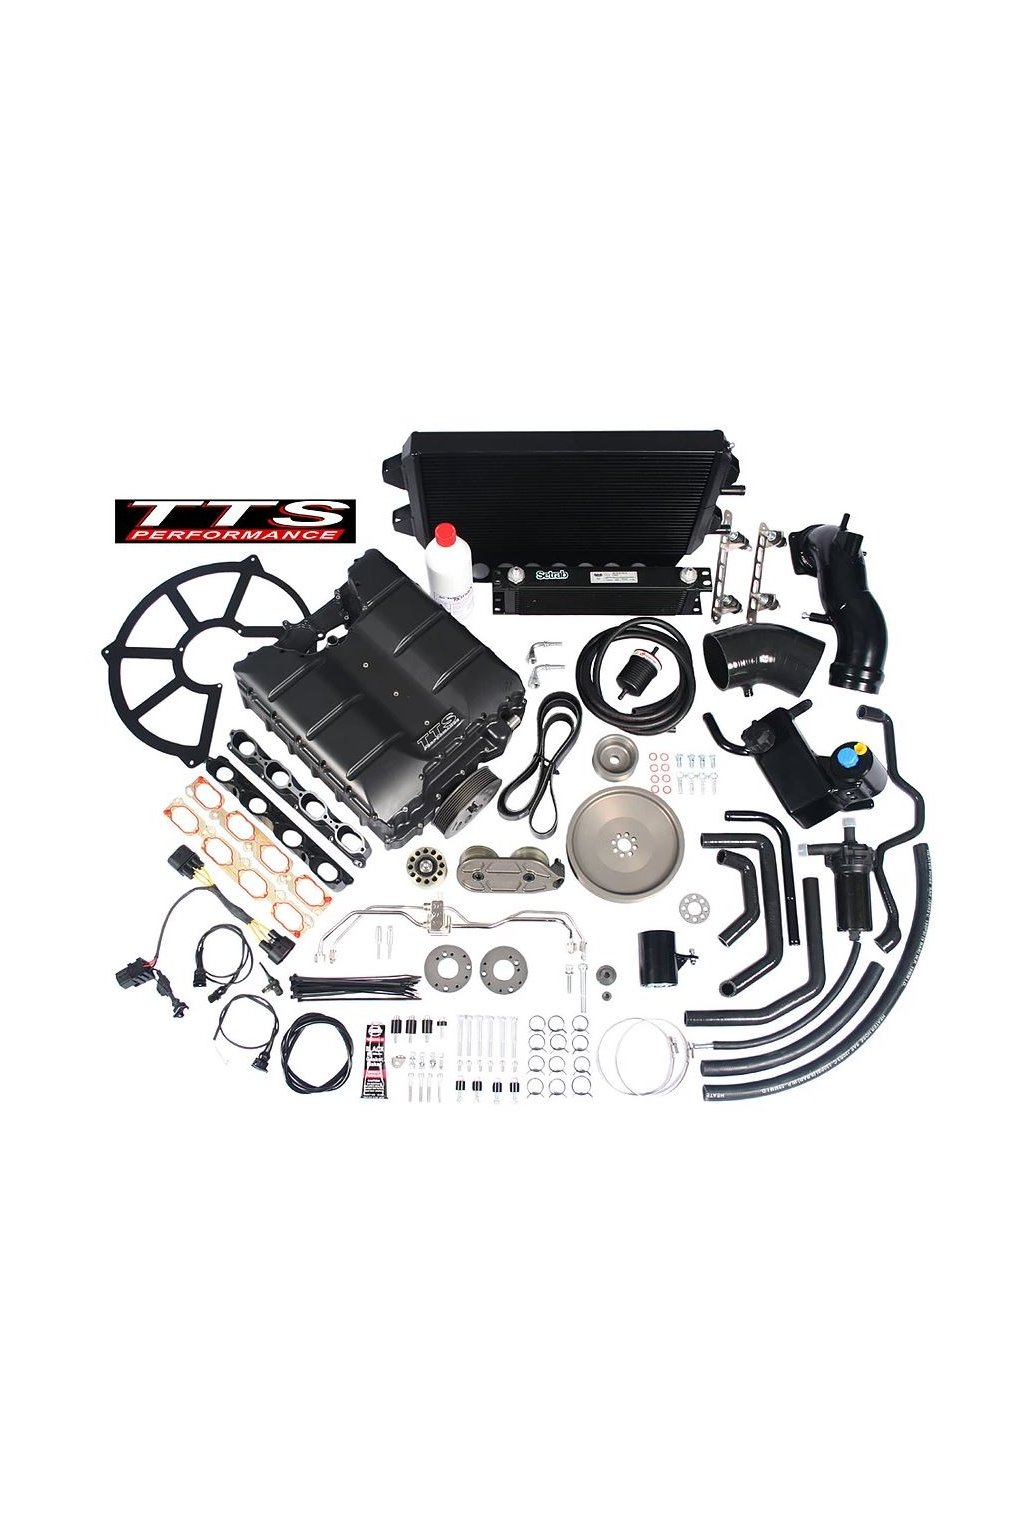 TTS Performance  Audi B7 RS4 4.2 FSI V8 Kompresor kit